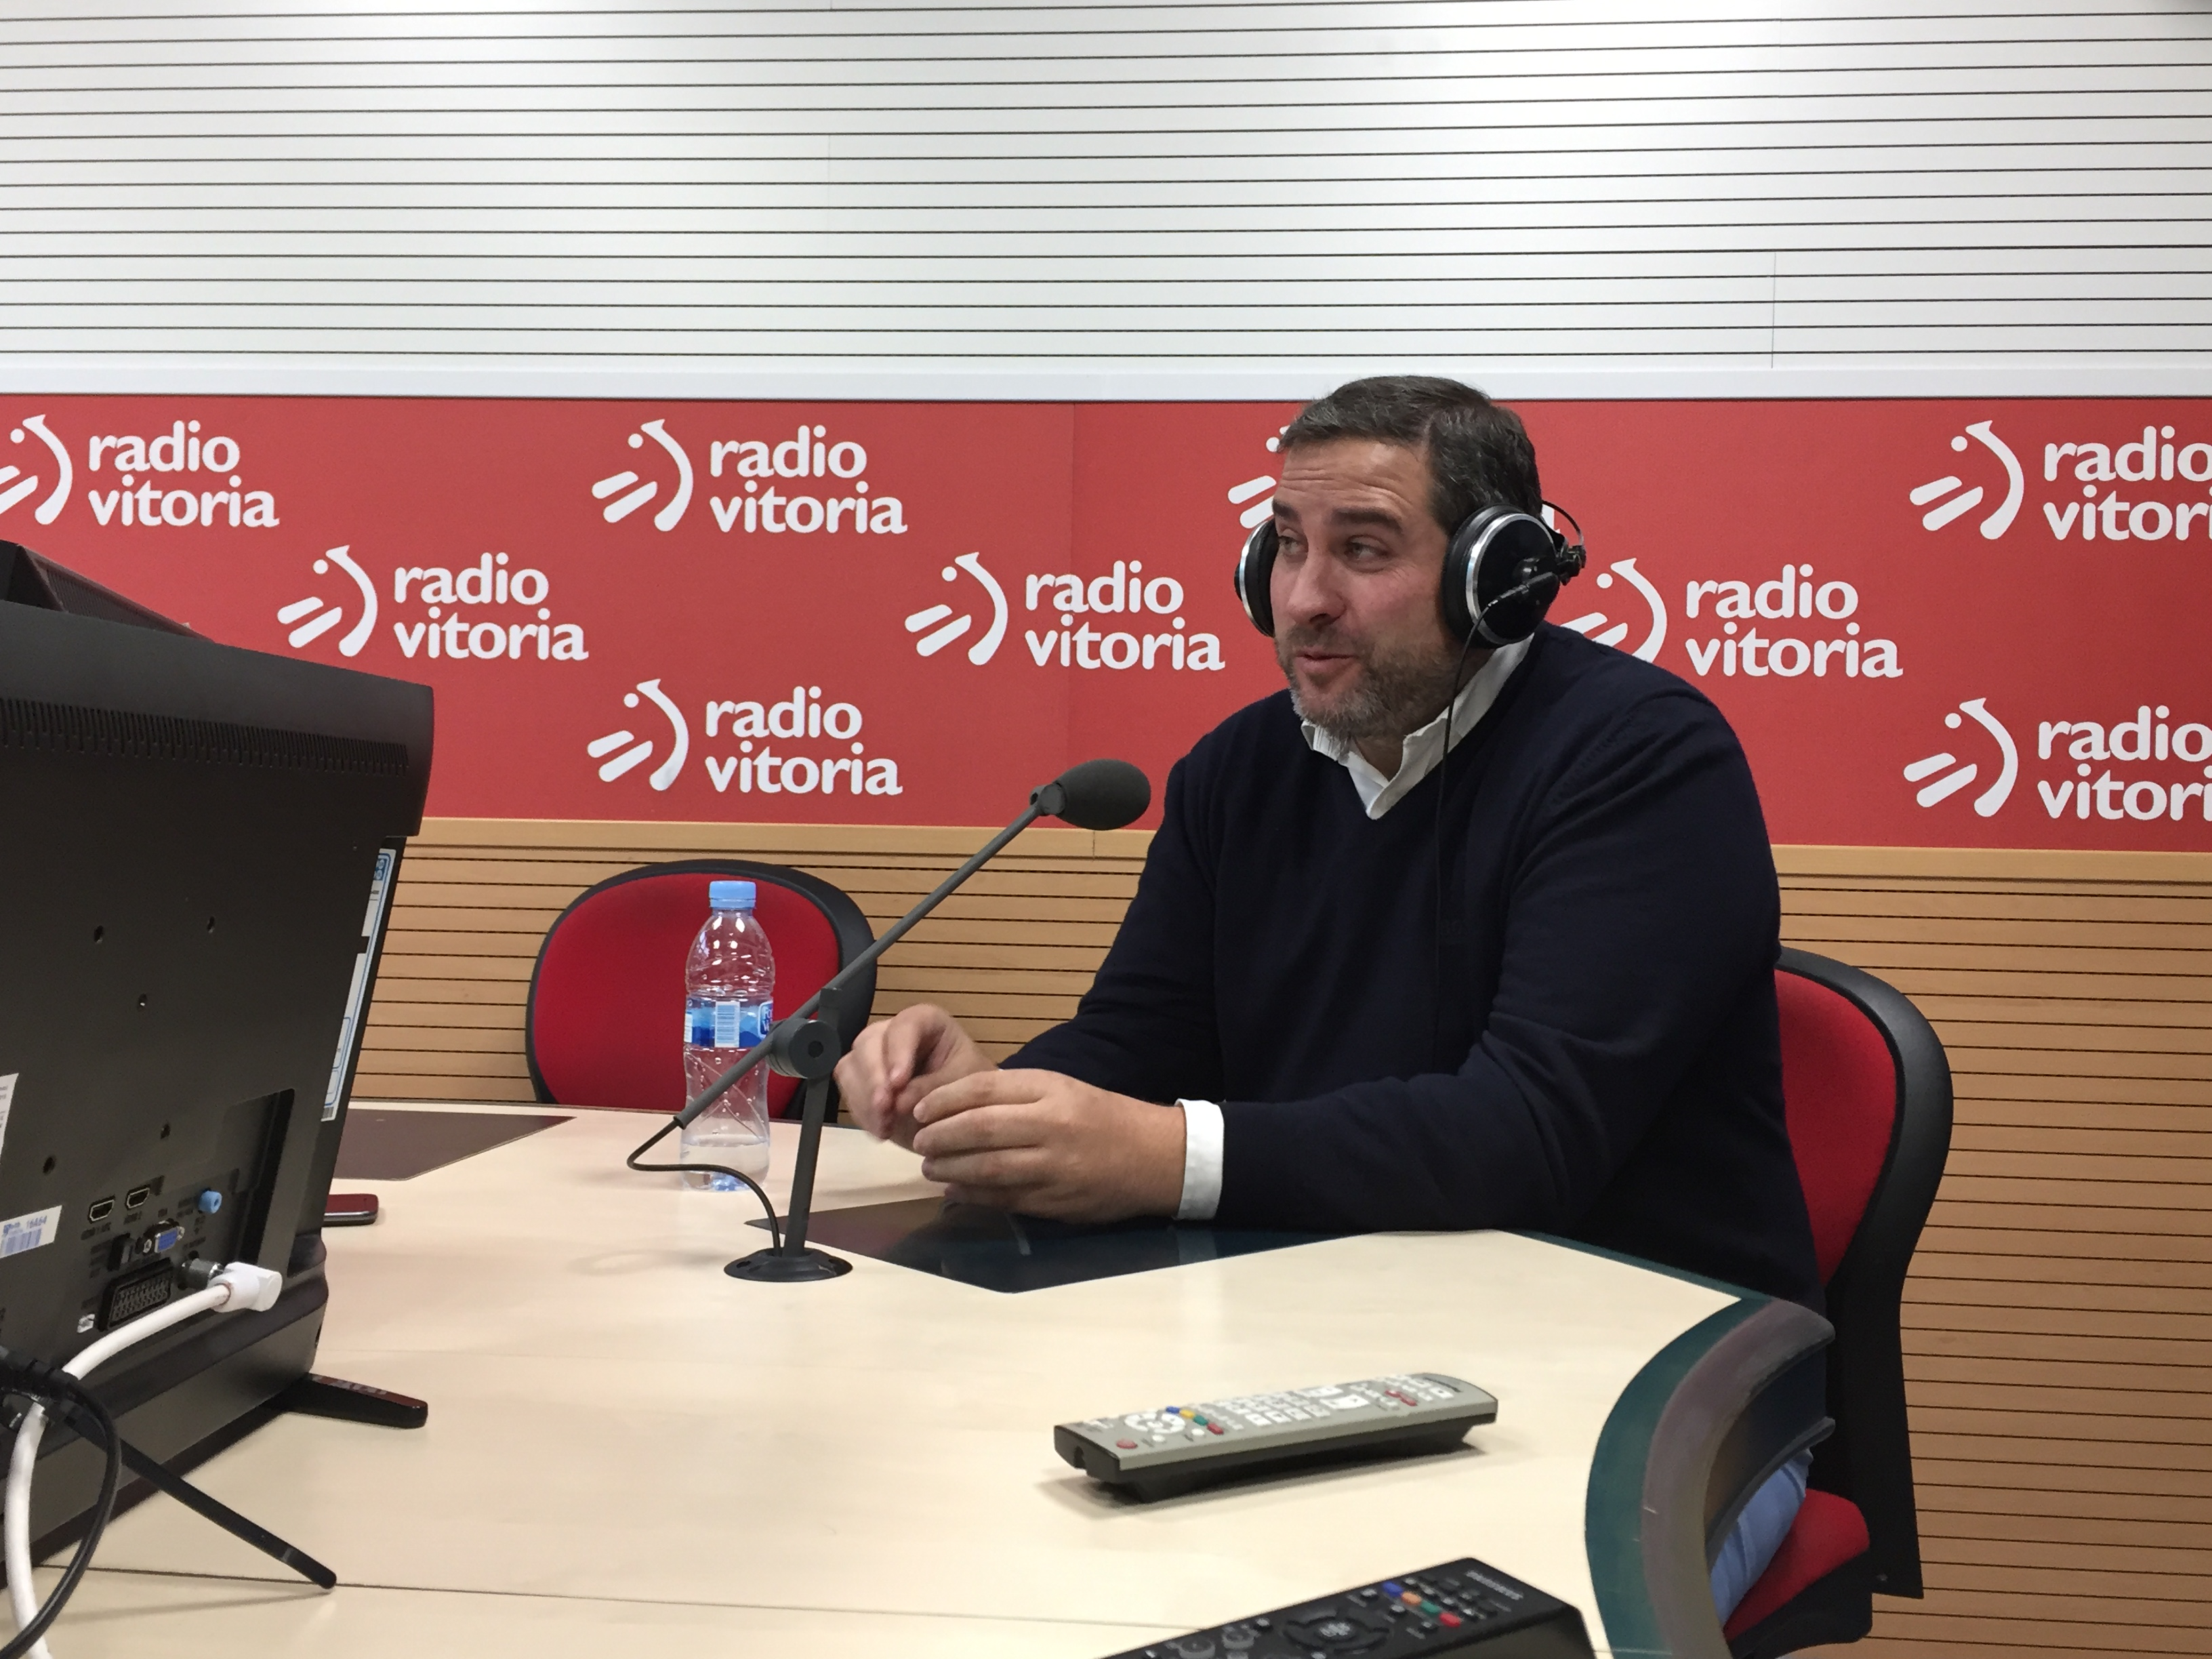 Air Studio Geoinformation Technologies Lorenzo Diaz de Apodaca